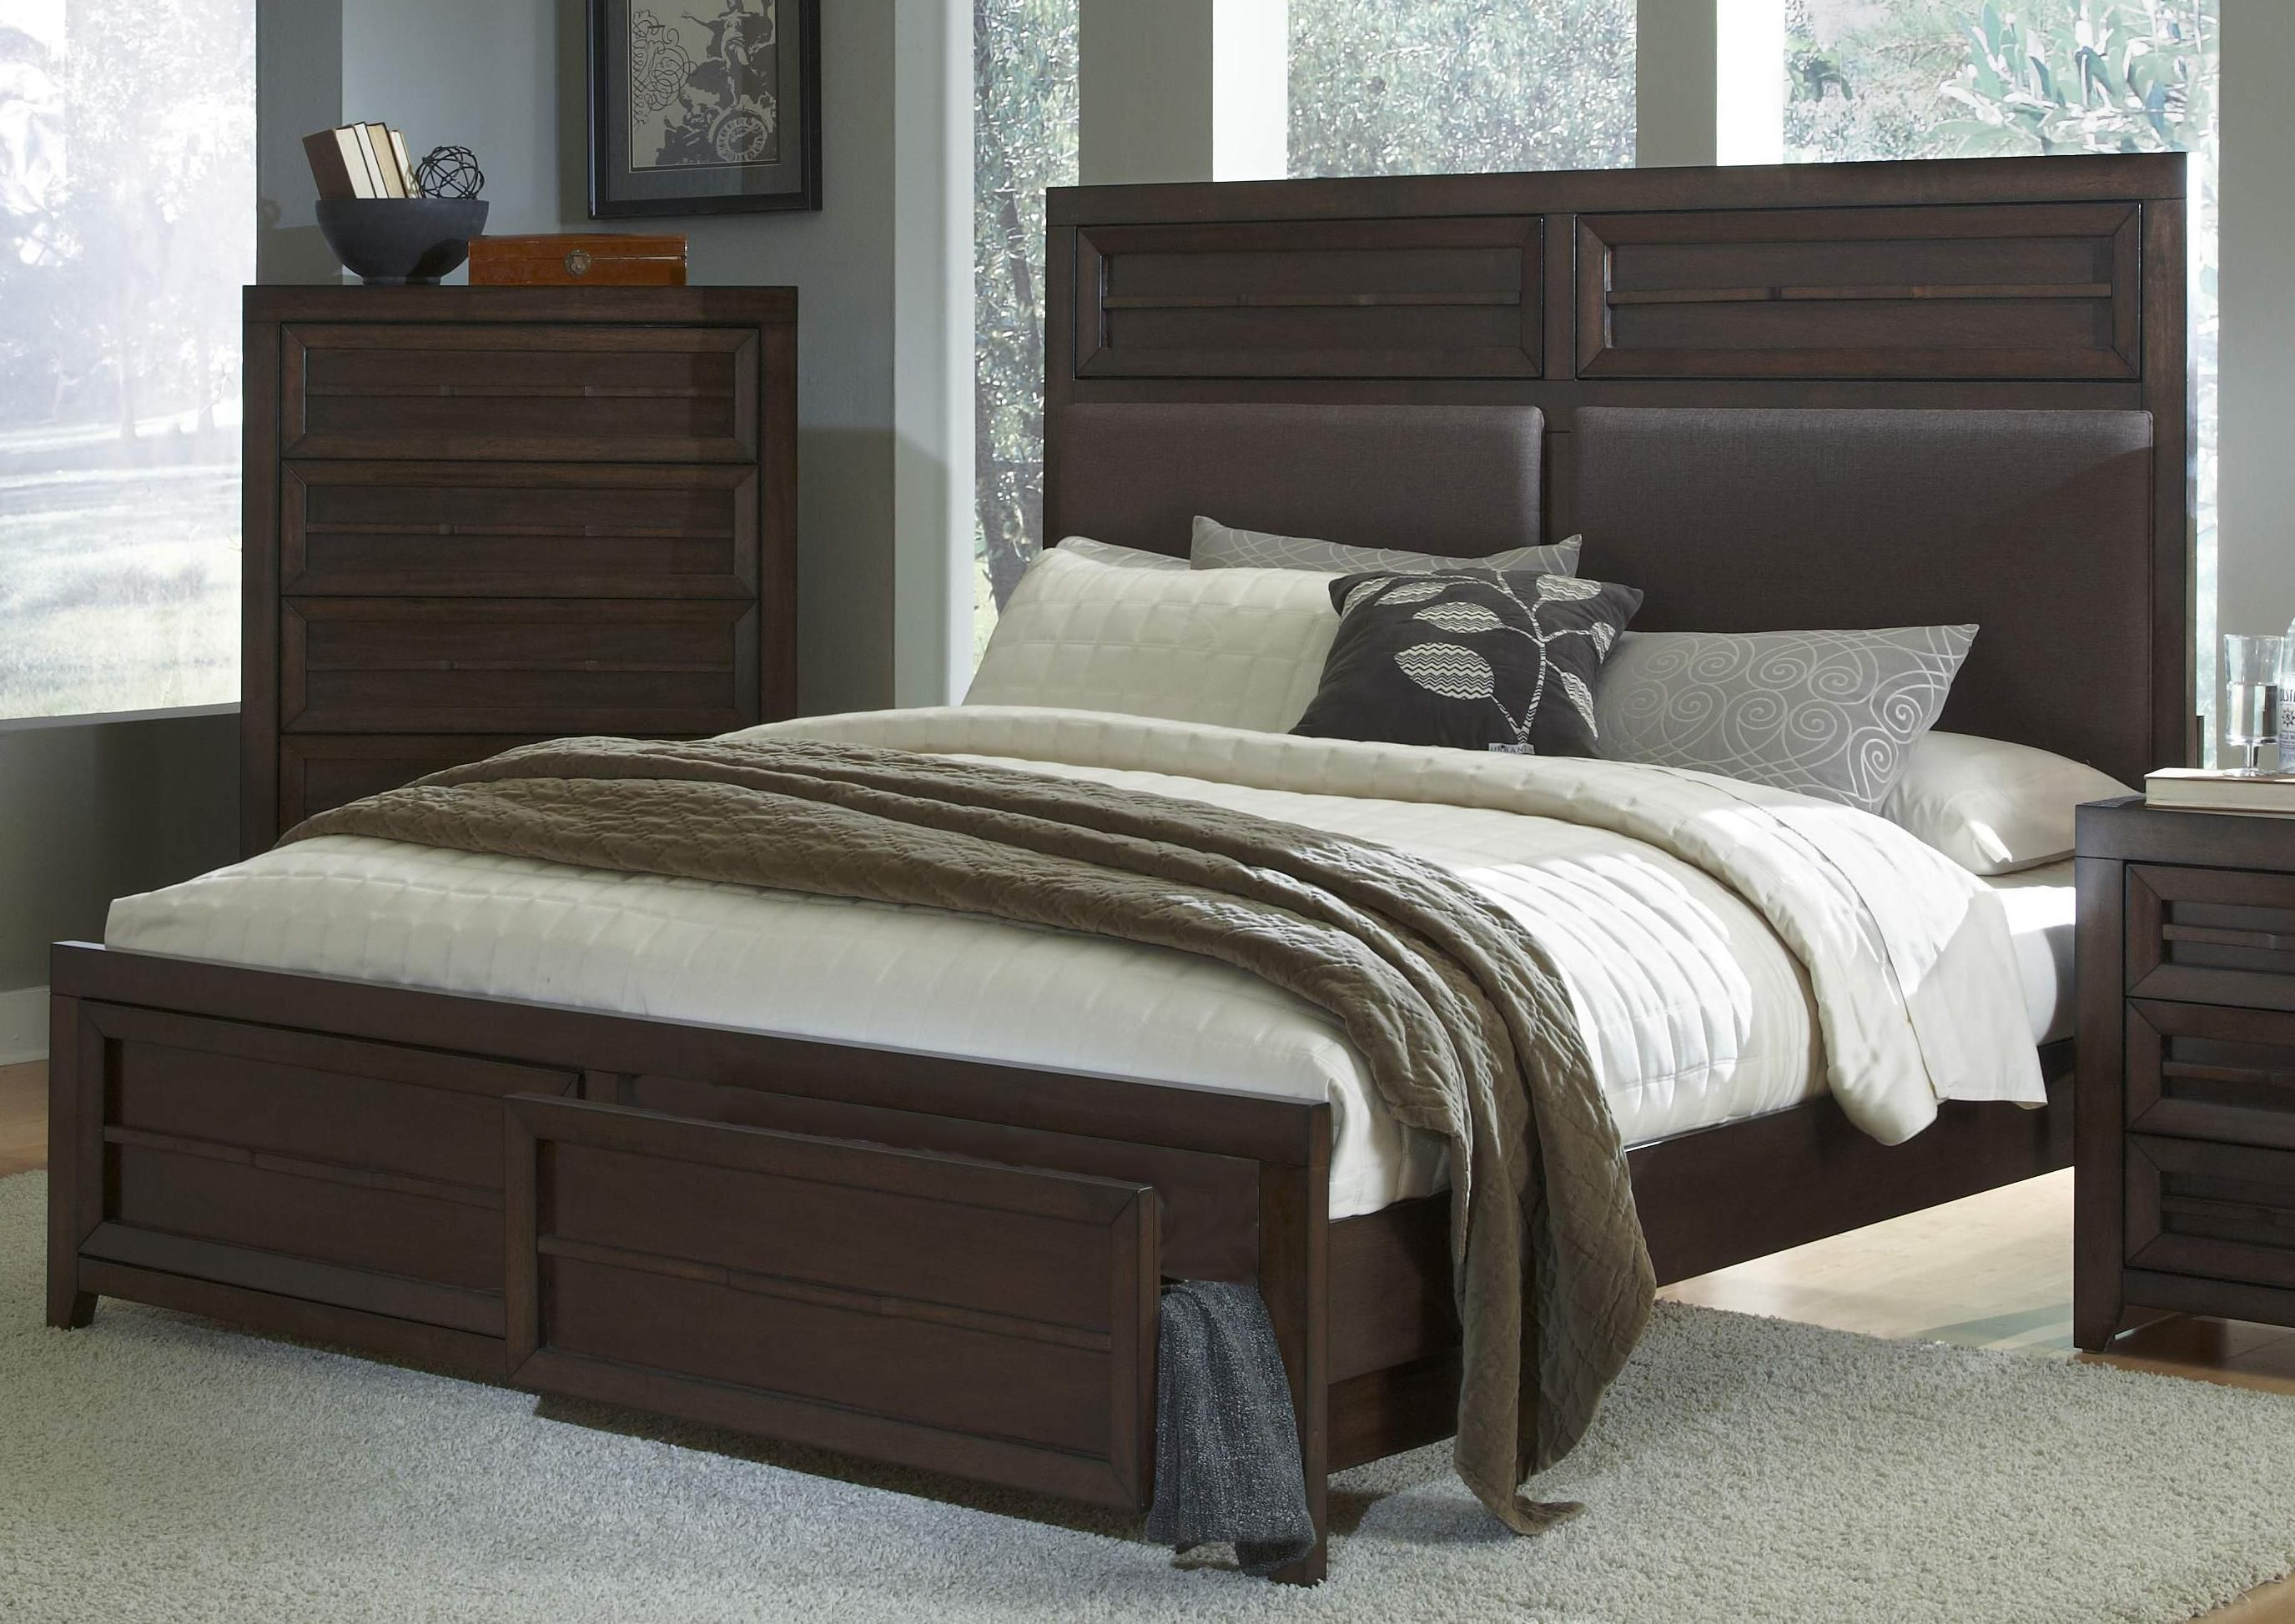 austin king upholstered storage bed by bk home home house bed rh pinterest com